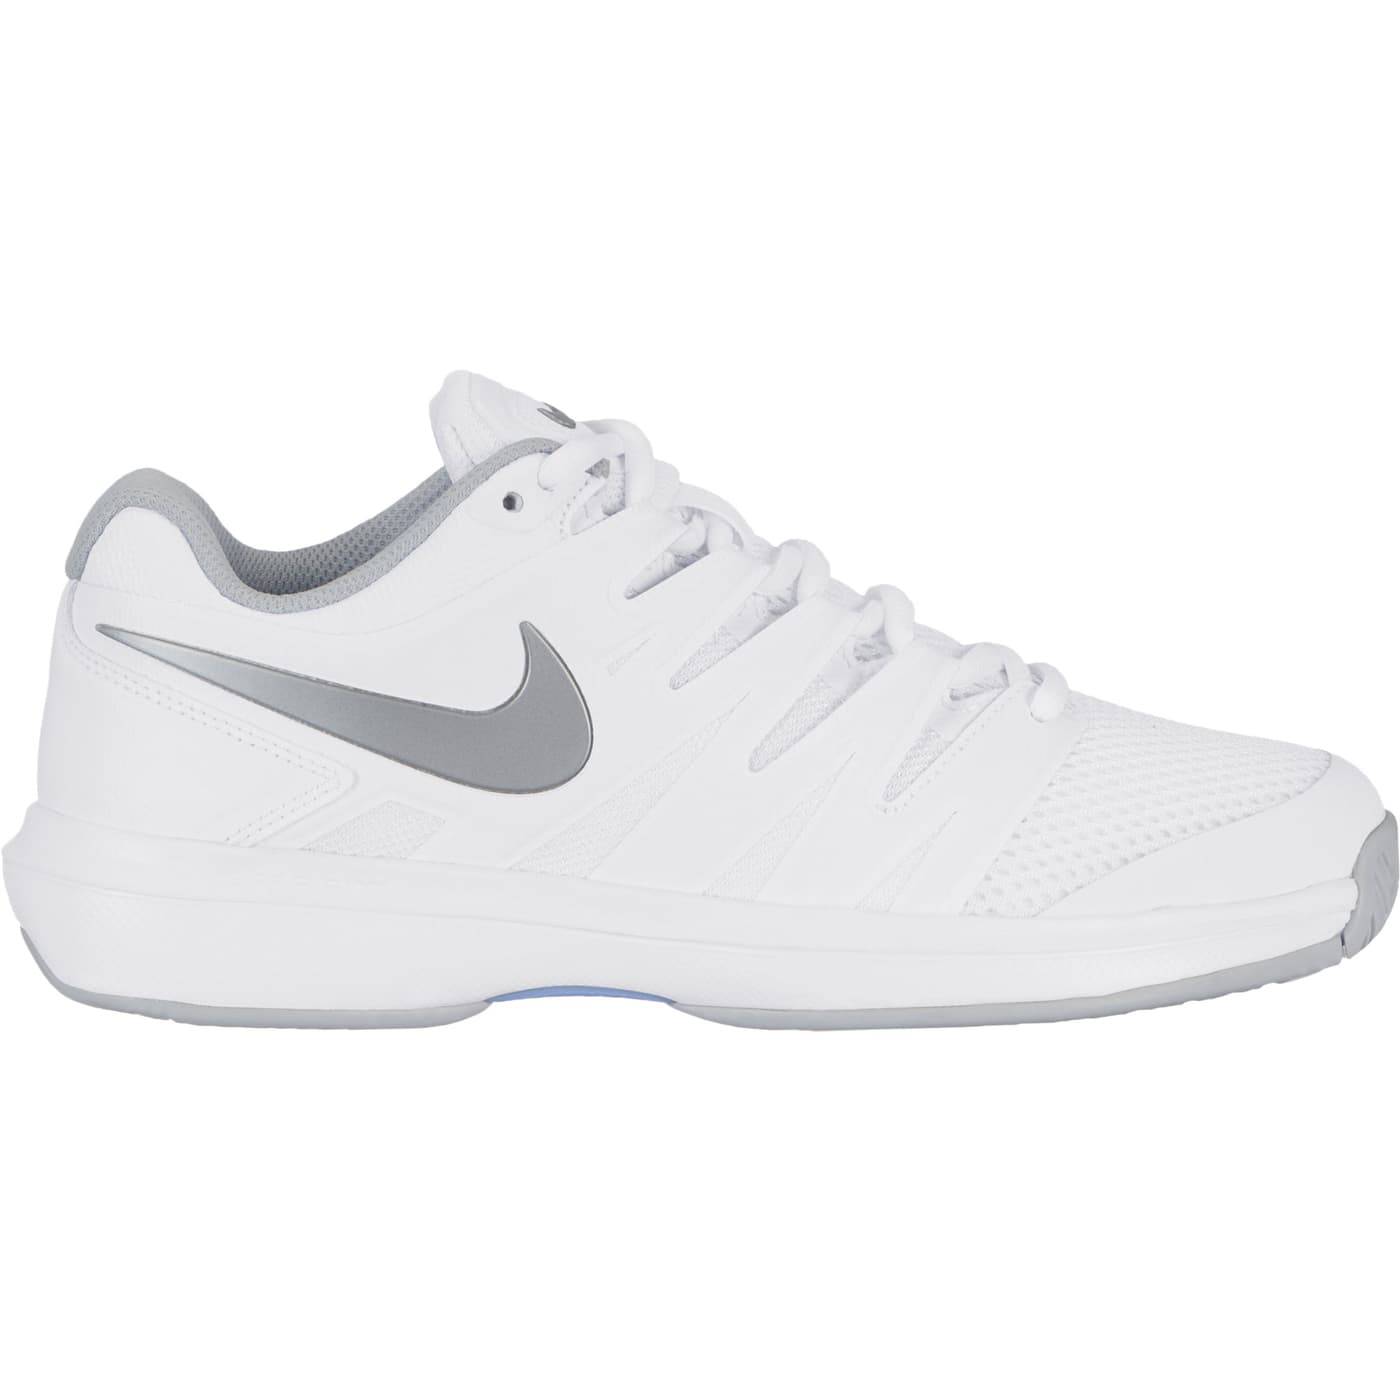 Air Damen Prestige Zoom Tennisschuh Nike 0X8PknwNO